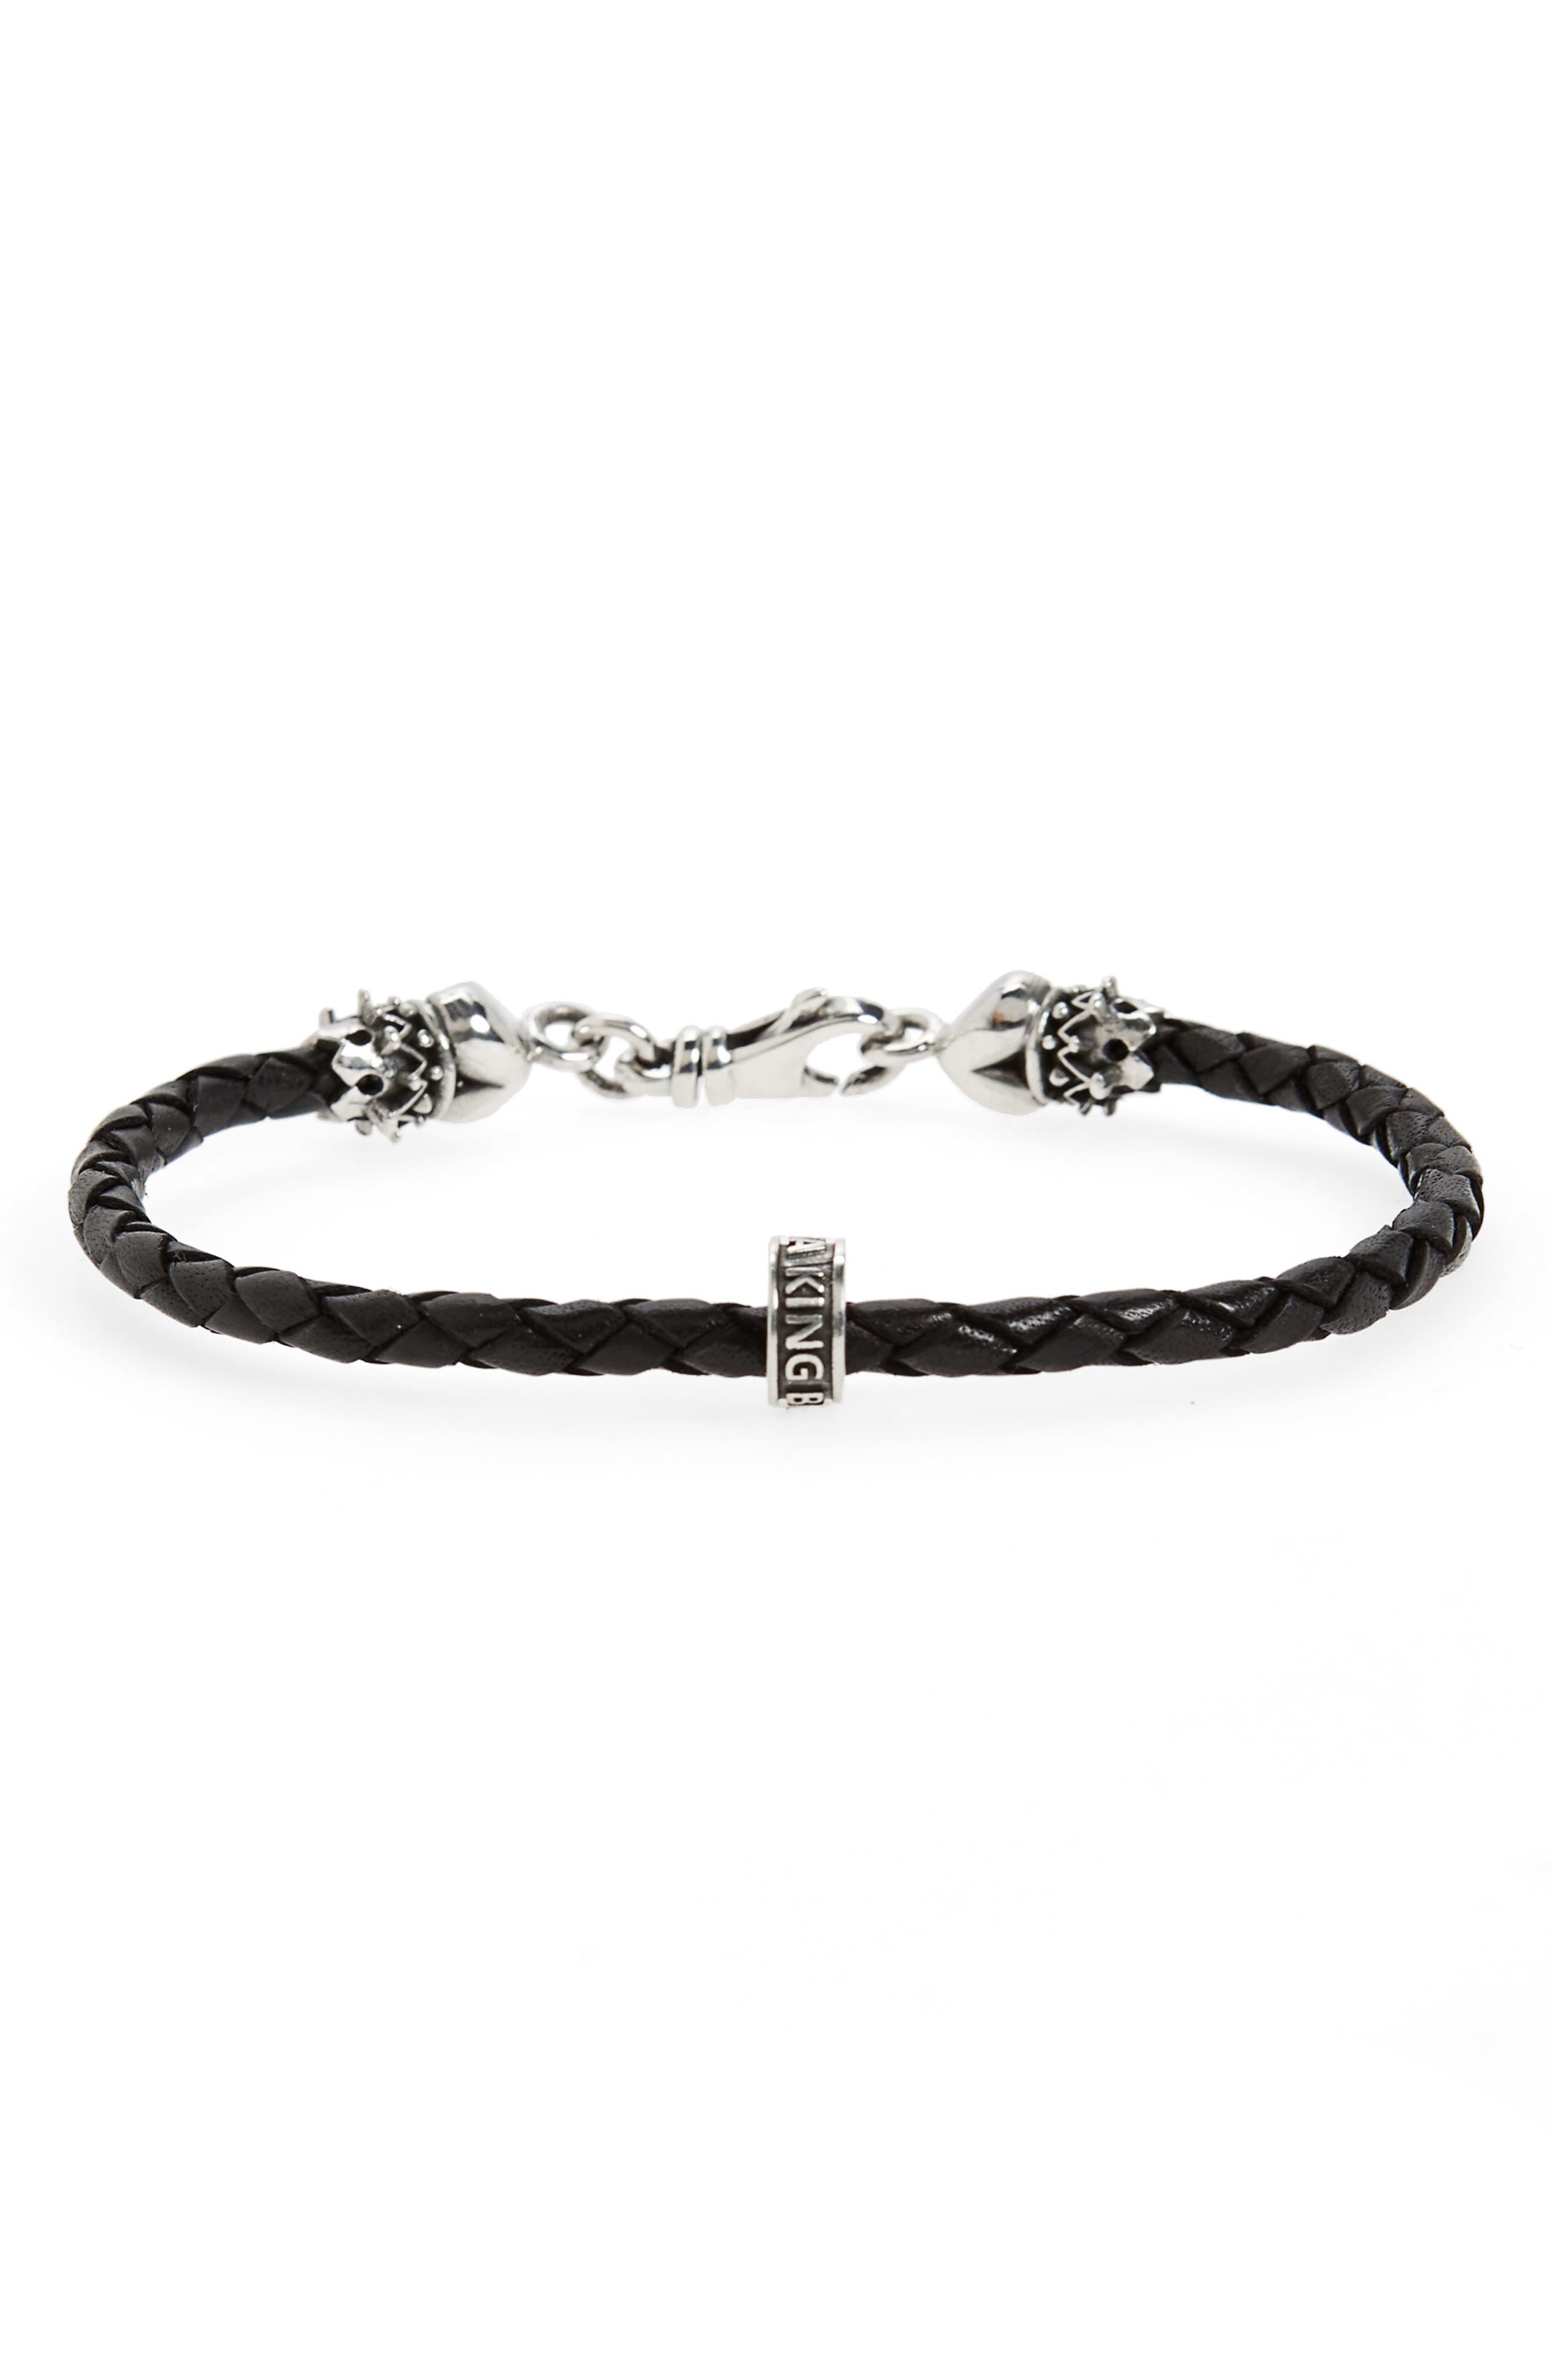 Braided Leather Bracelet,                             Main thumbnail 1, color,                             041